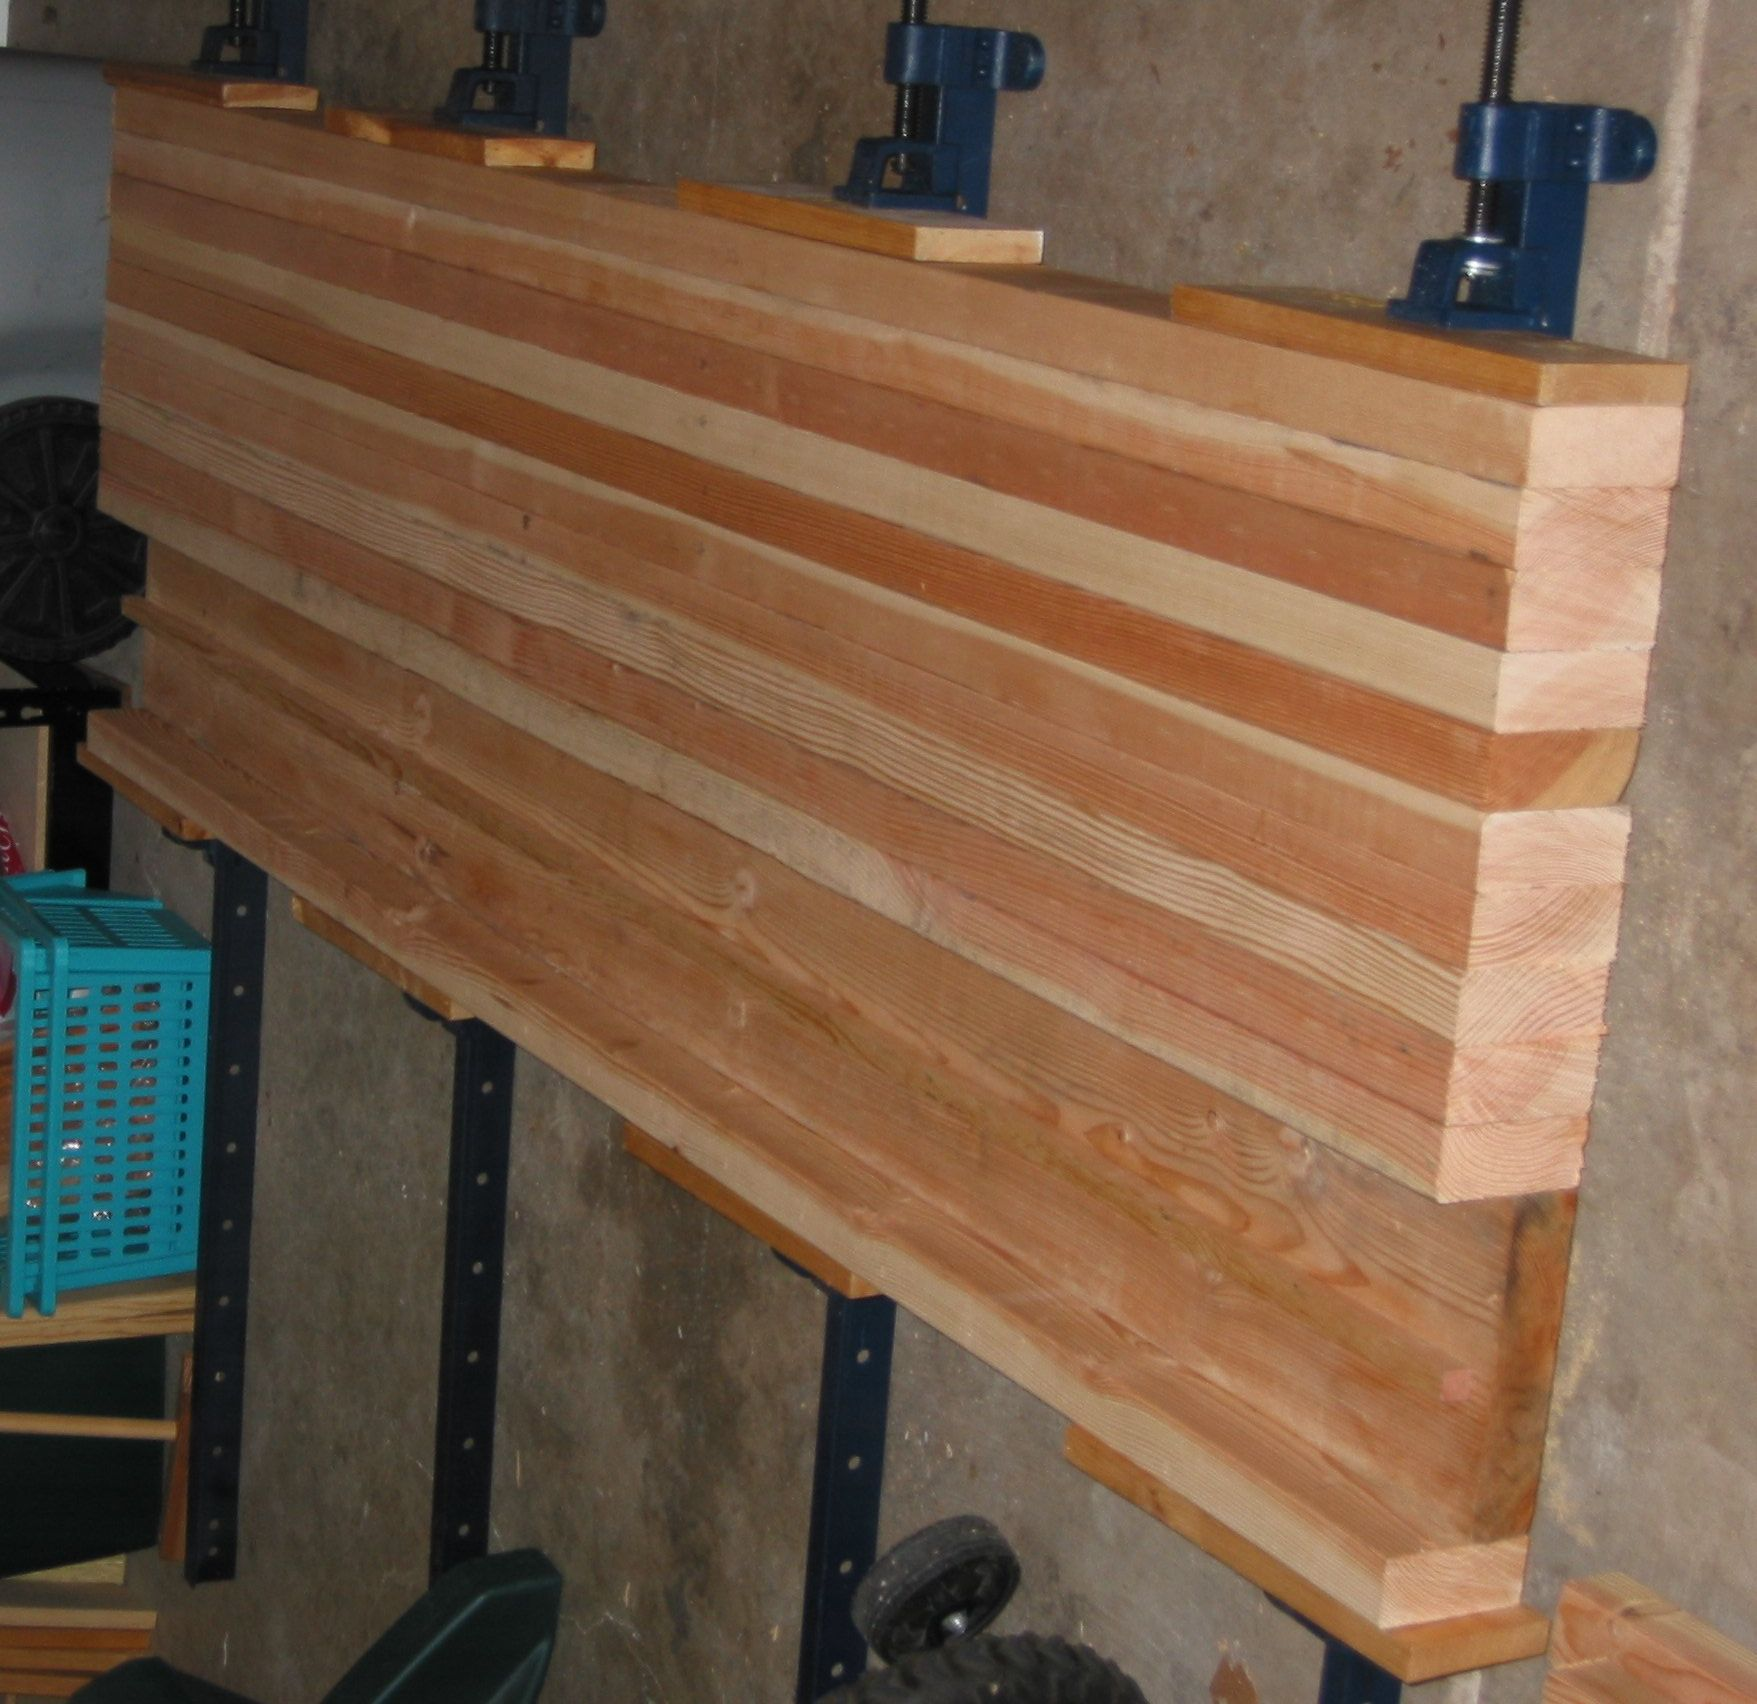 2x4 Workbench Plans: Workbench Top Using 2X4's Or 2X3's